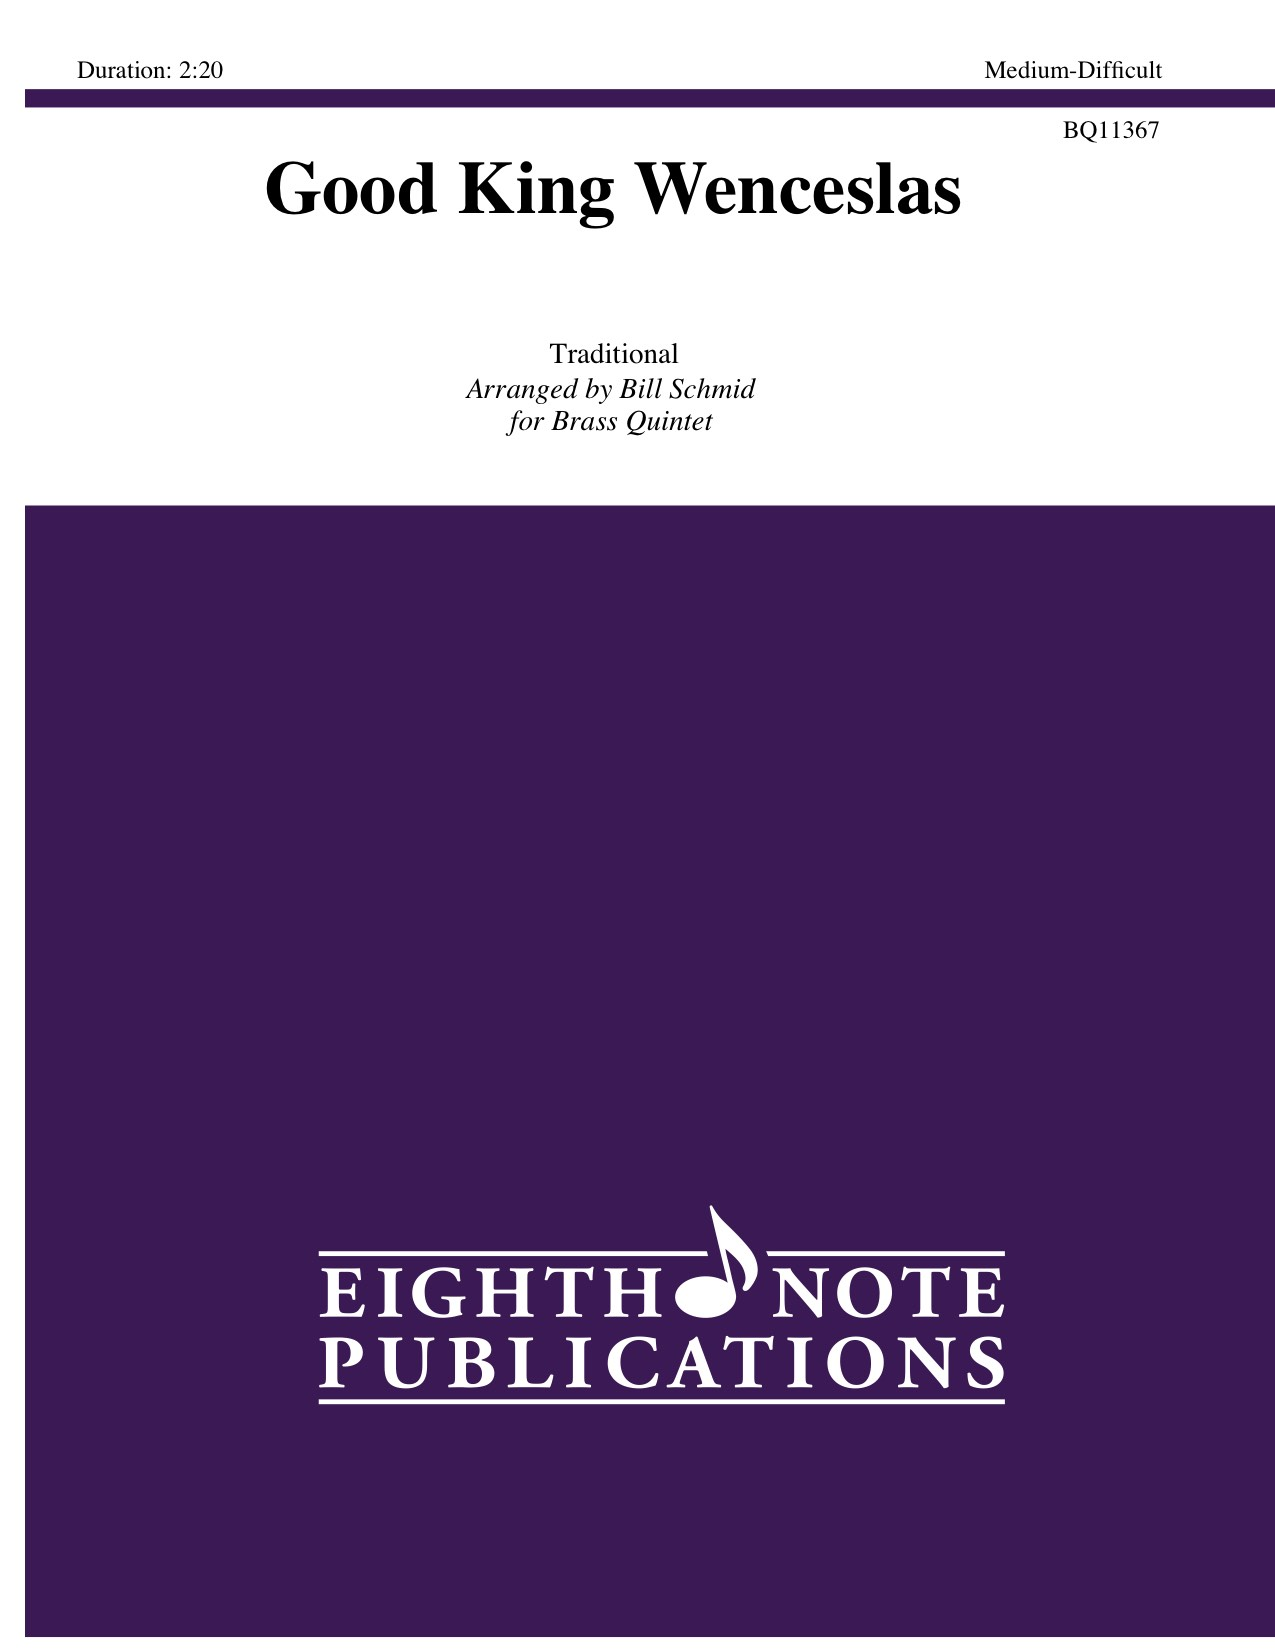 Good King Wenceslas -  Traditional